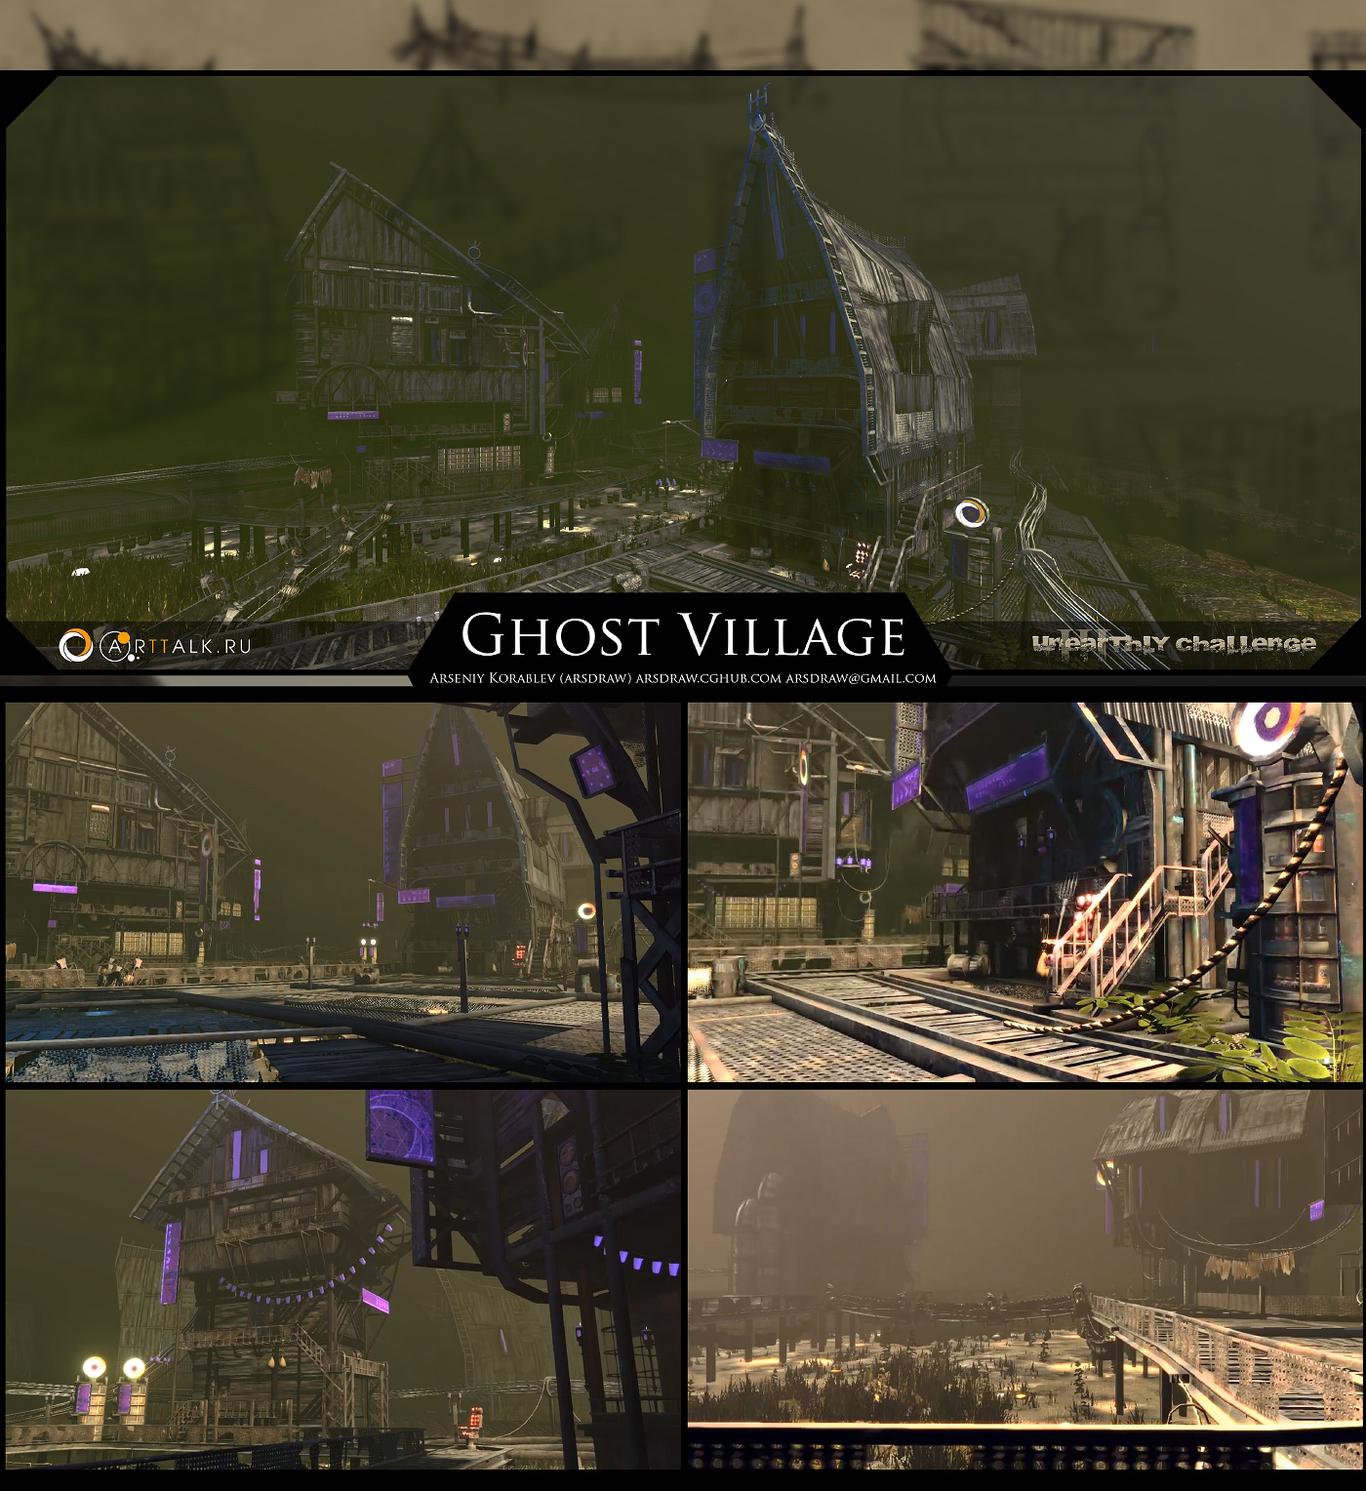 Arsdraw ghost village realti 1 7d494484 m5jg